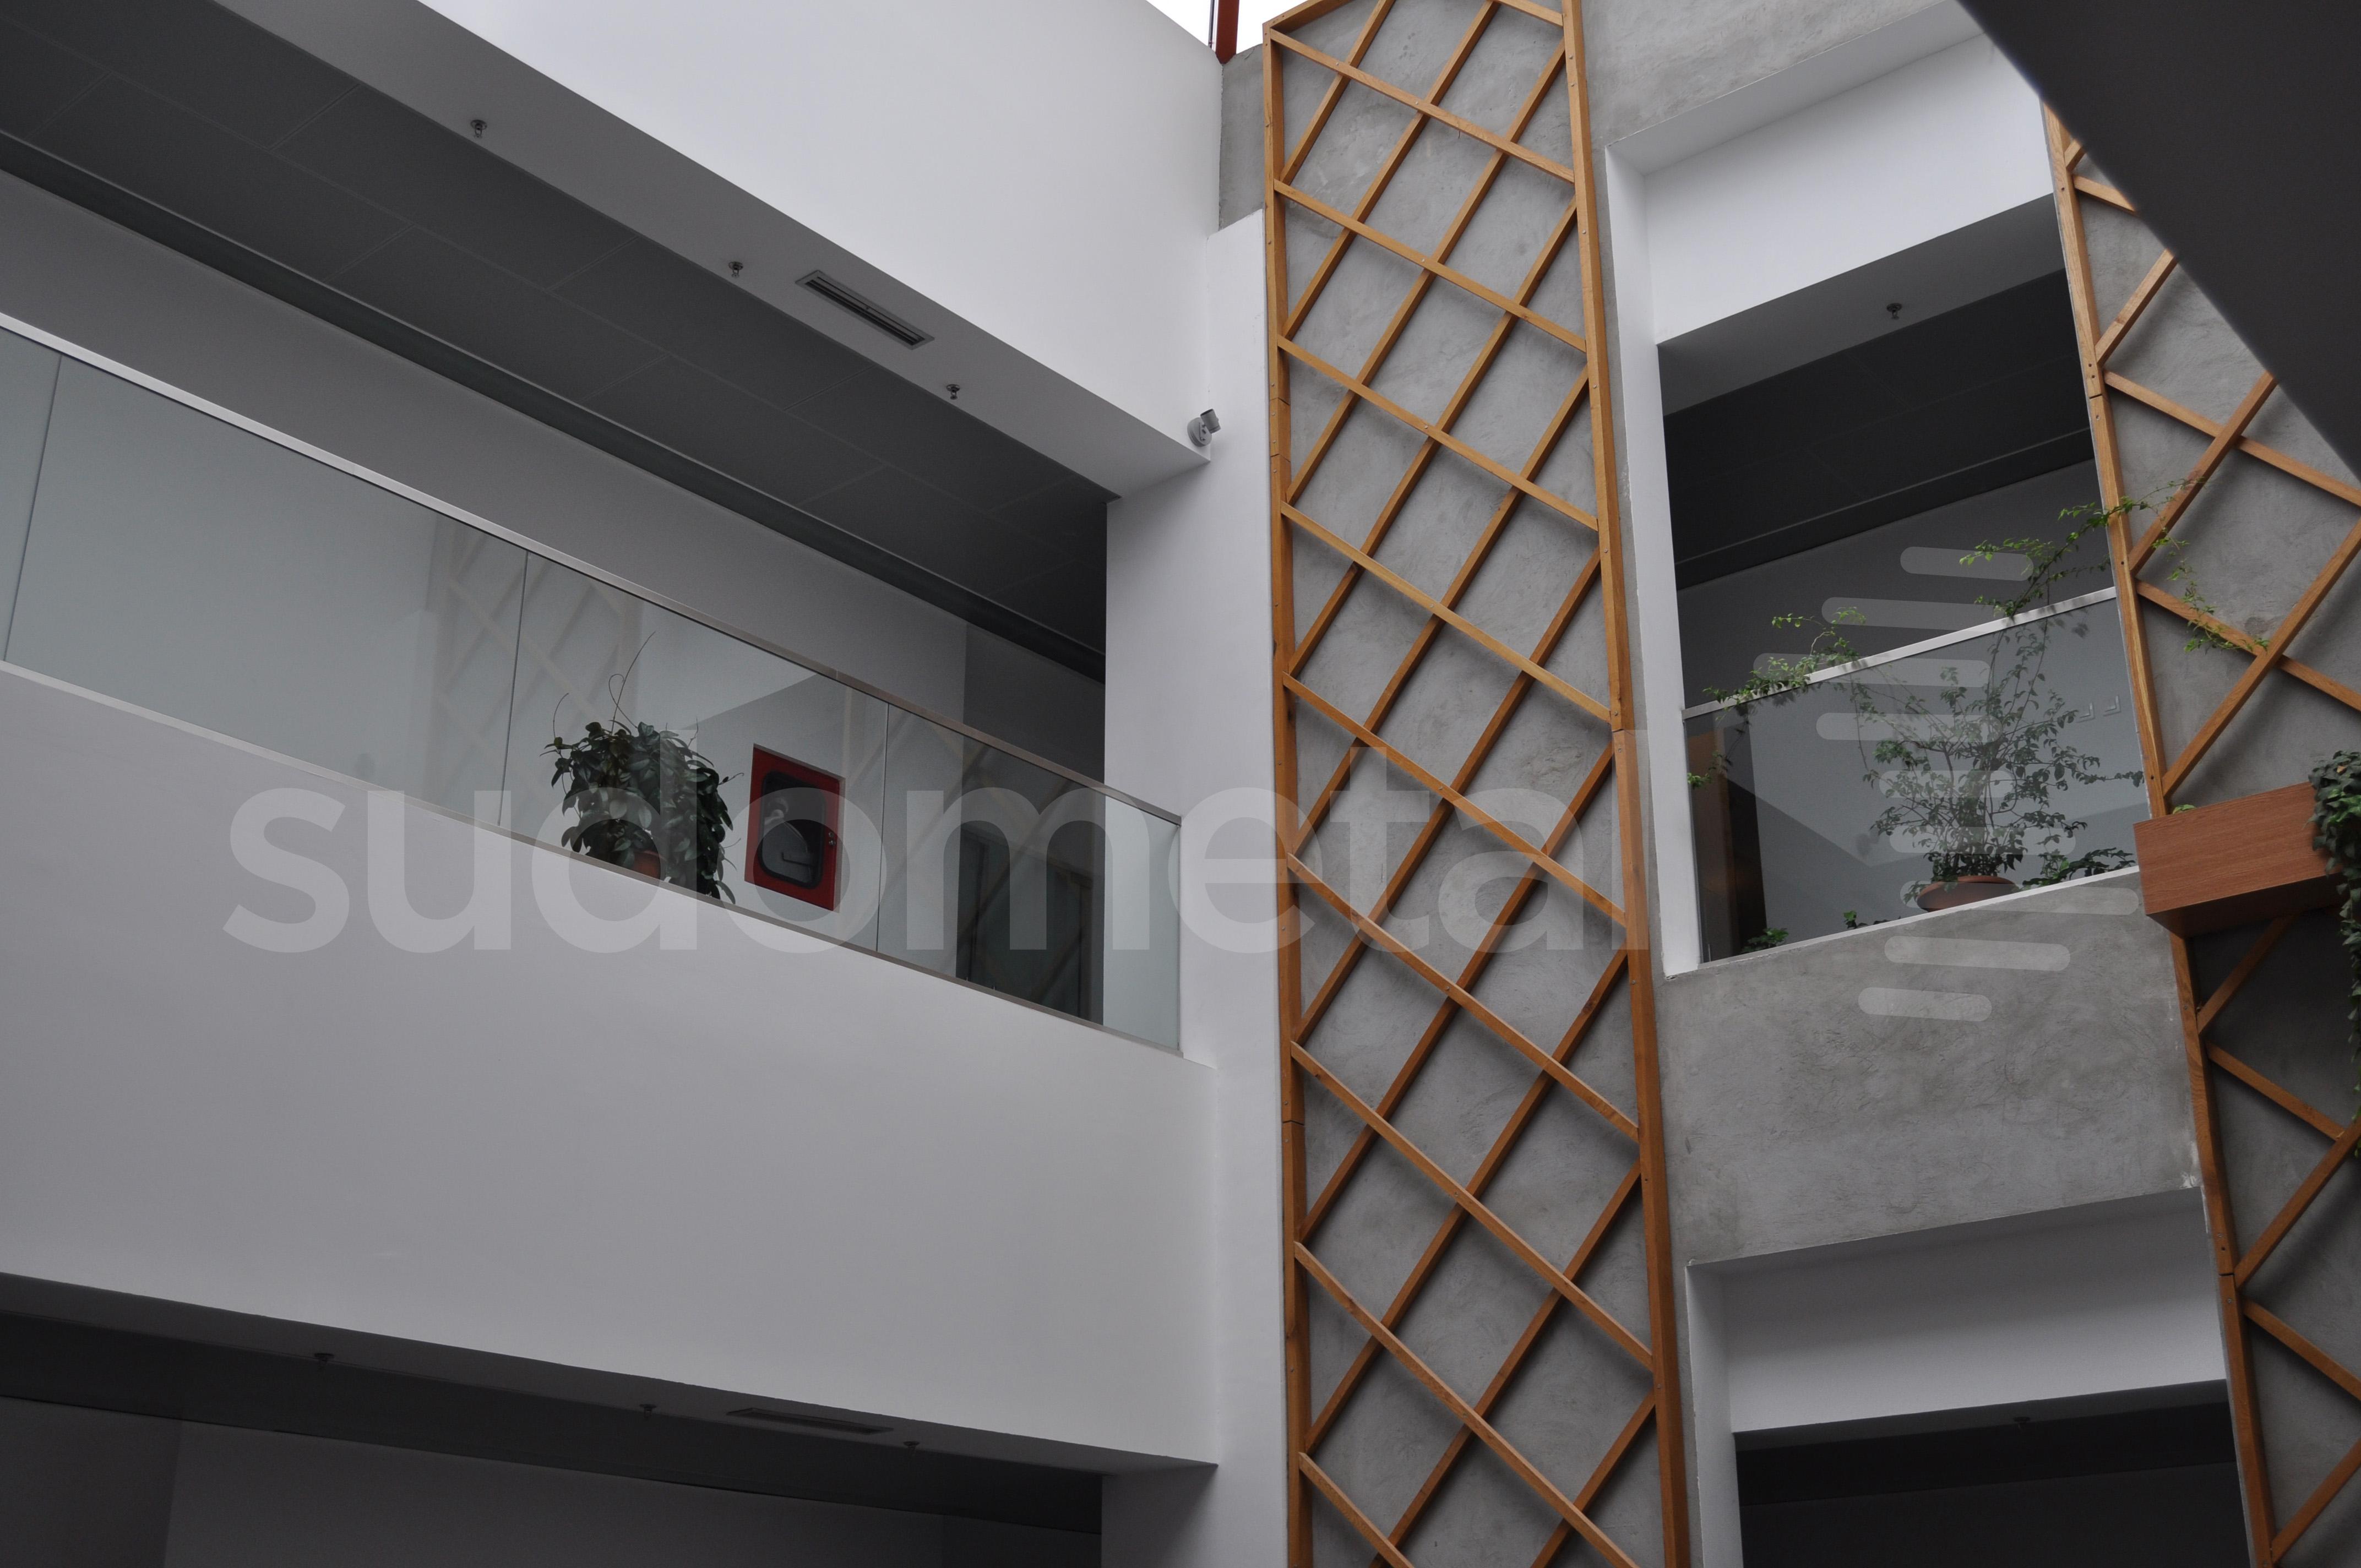 Balustrade din sticla - Balustrada cladire de birouri 30 Avenue, Bacau SUDOMETAL - Poza 3